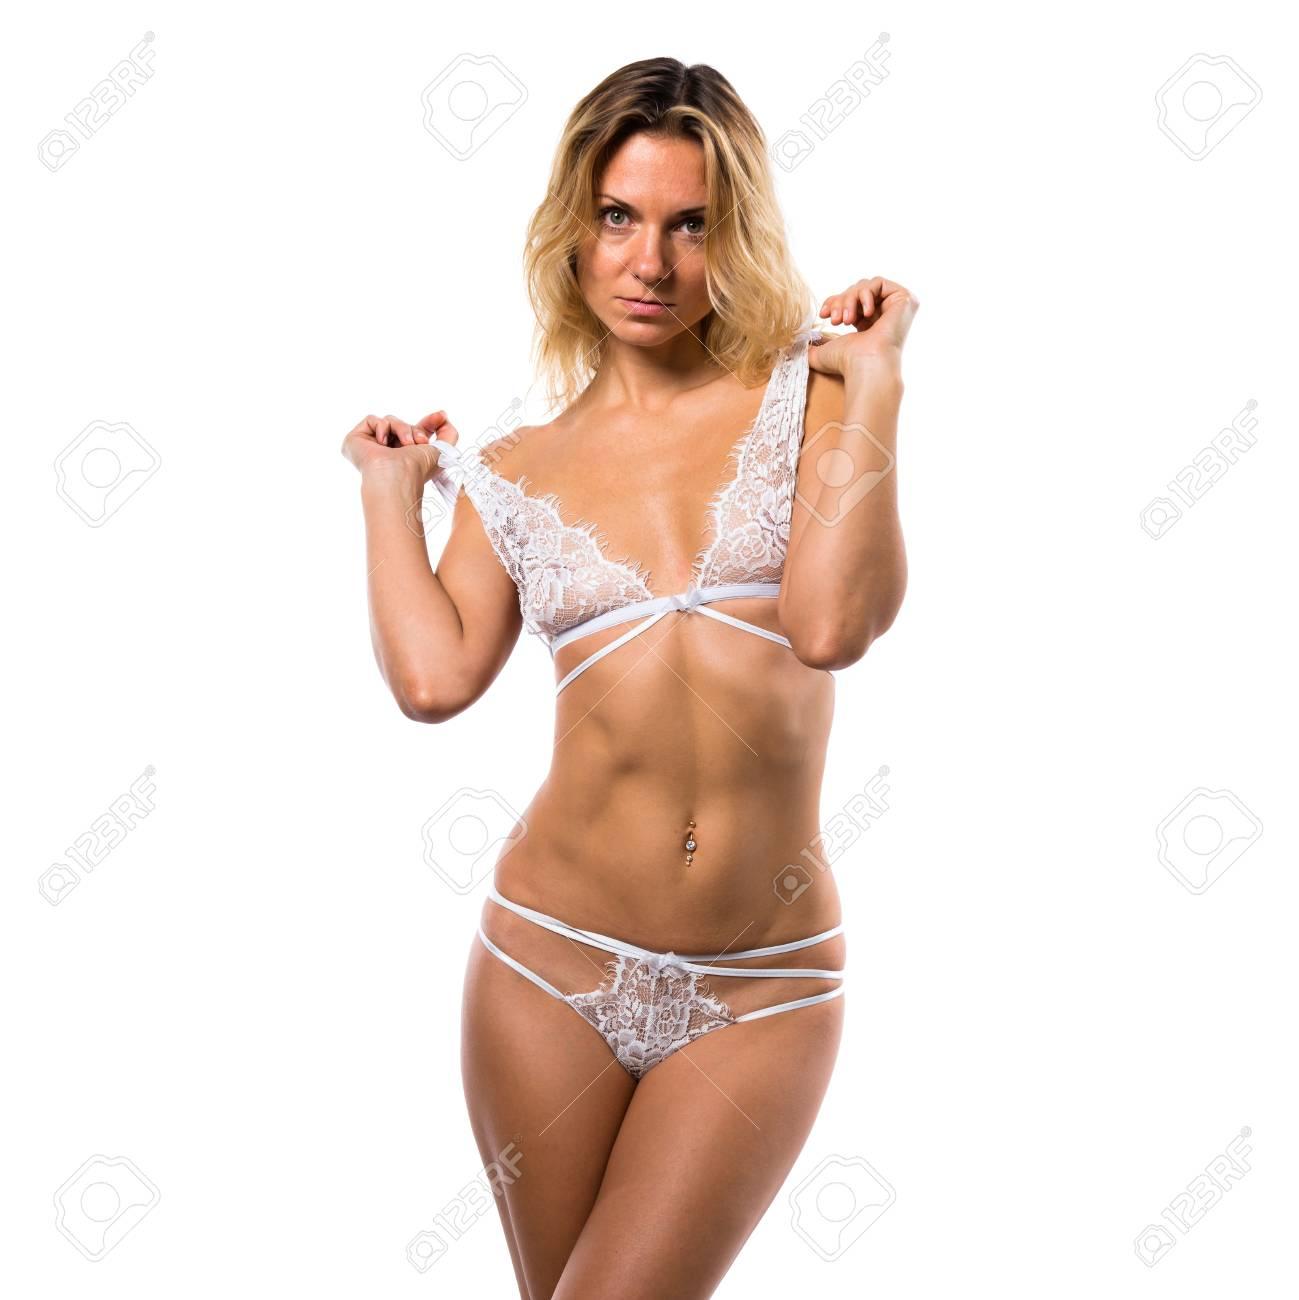 Bbw orgies in lingerie